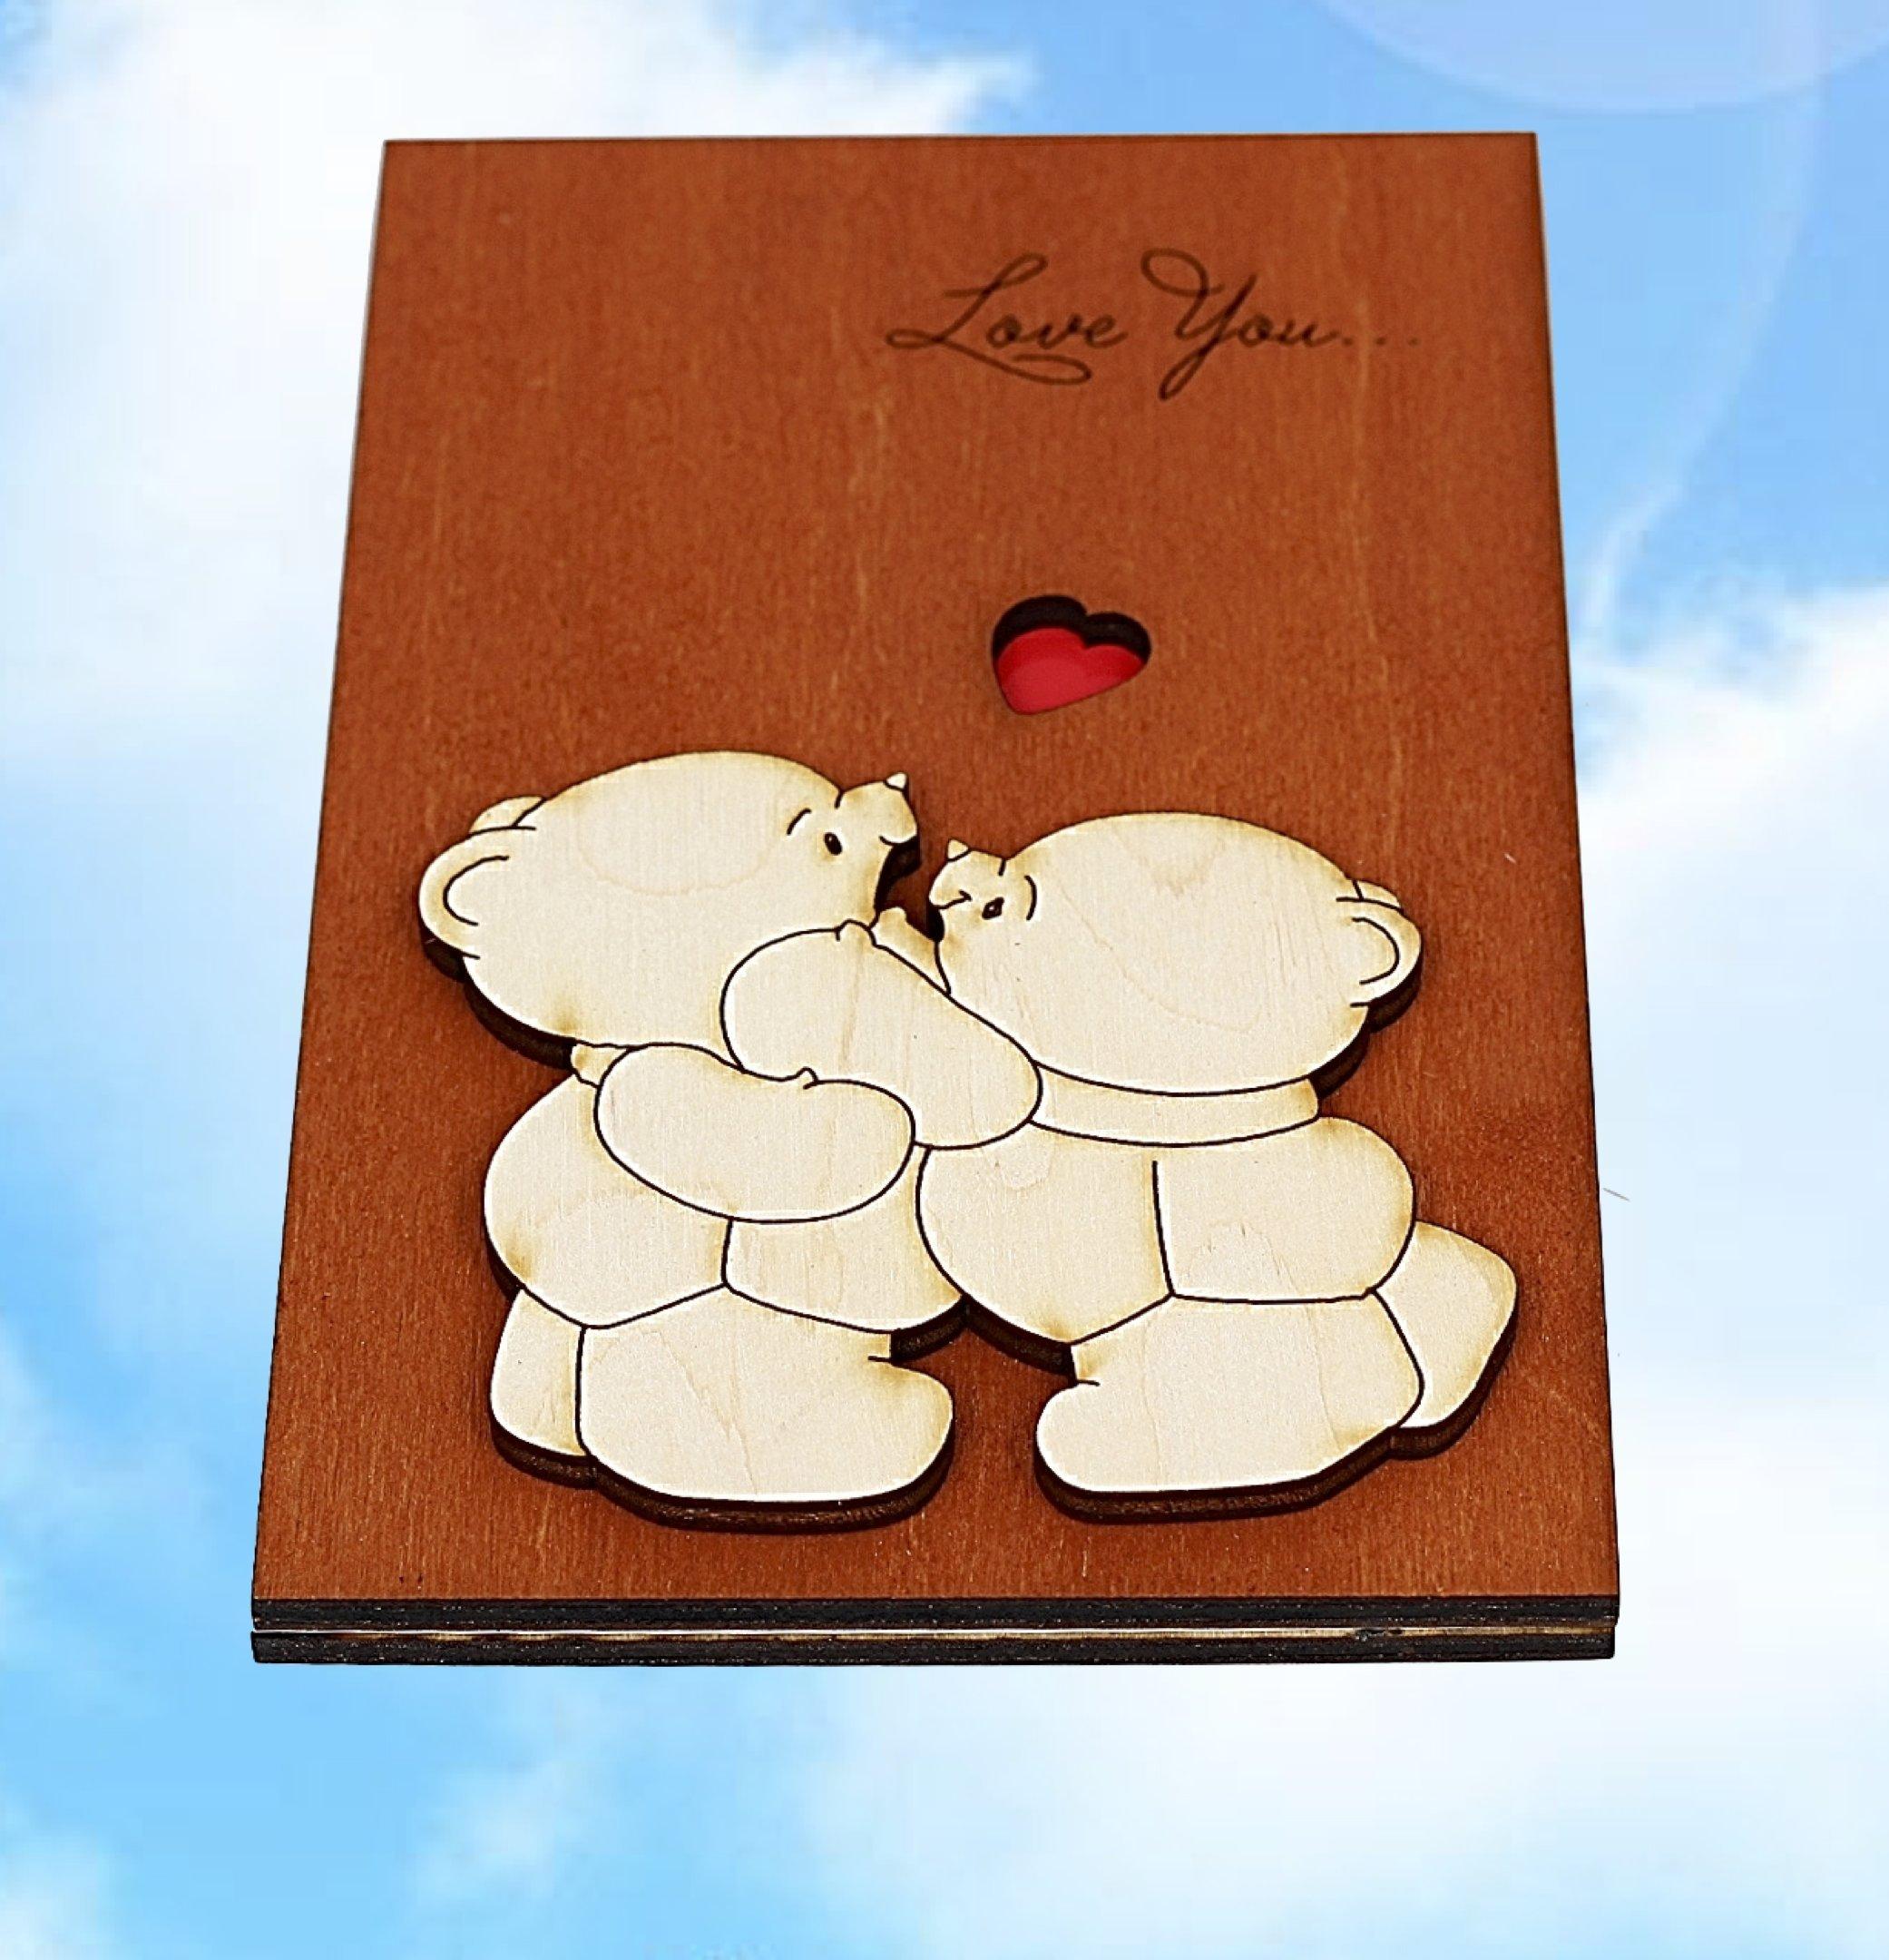 Handmade Real Wood Cute Love You Teddy Bears Funny Novelty Birthday